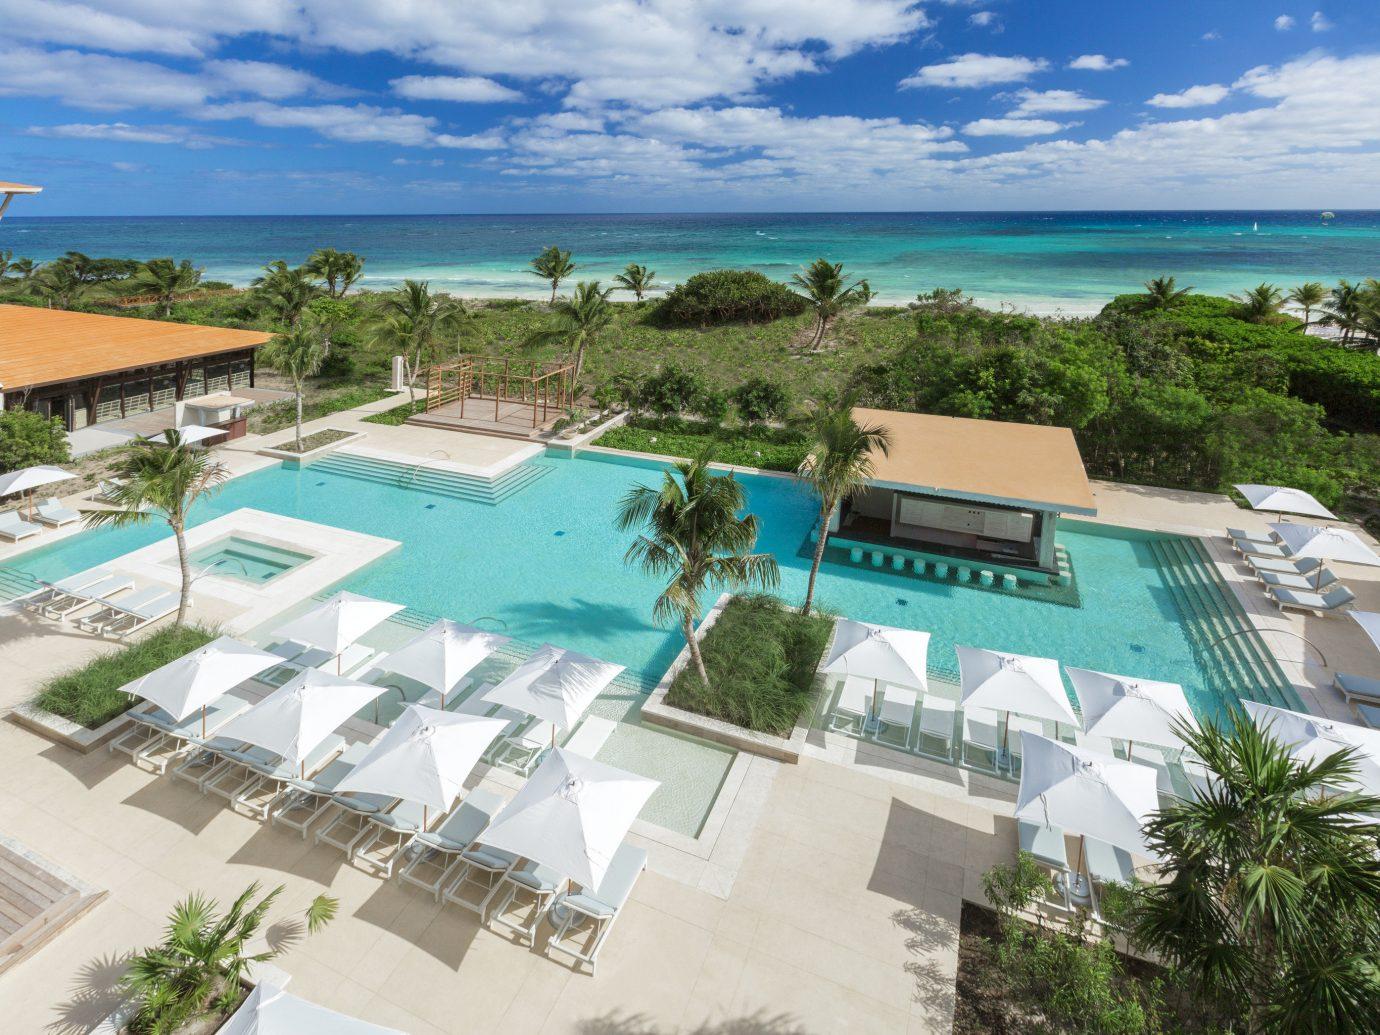 Hotels outdoor property leisure condominium Resort swimming pool estate vacation Villa real estate Nature caribbean mansion Deck shore Island